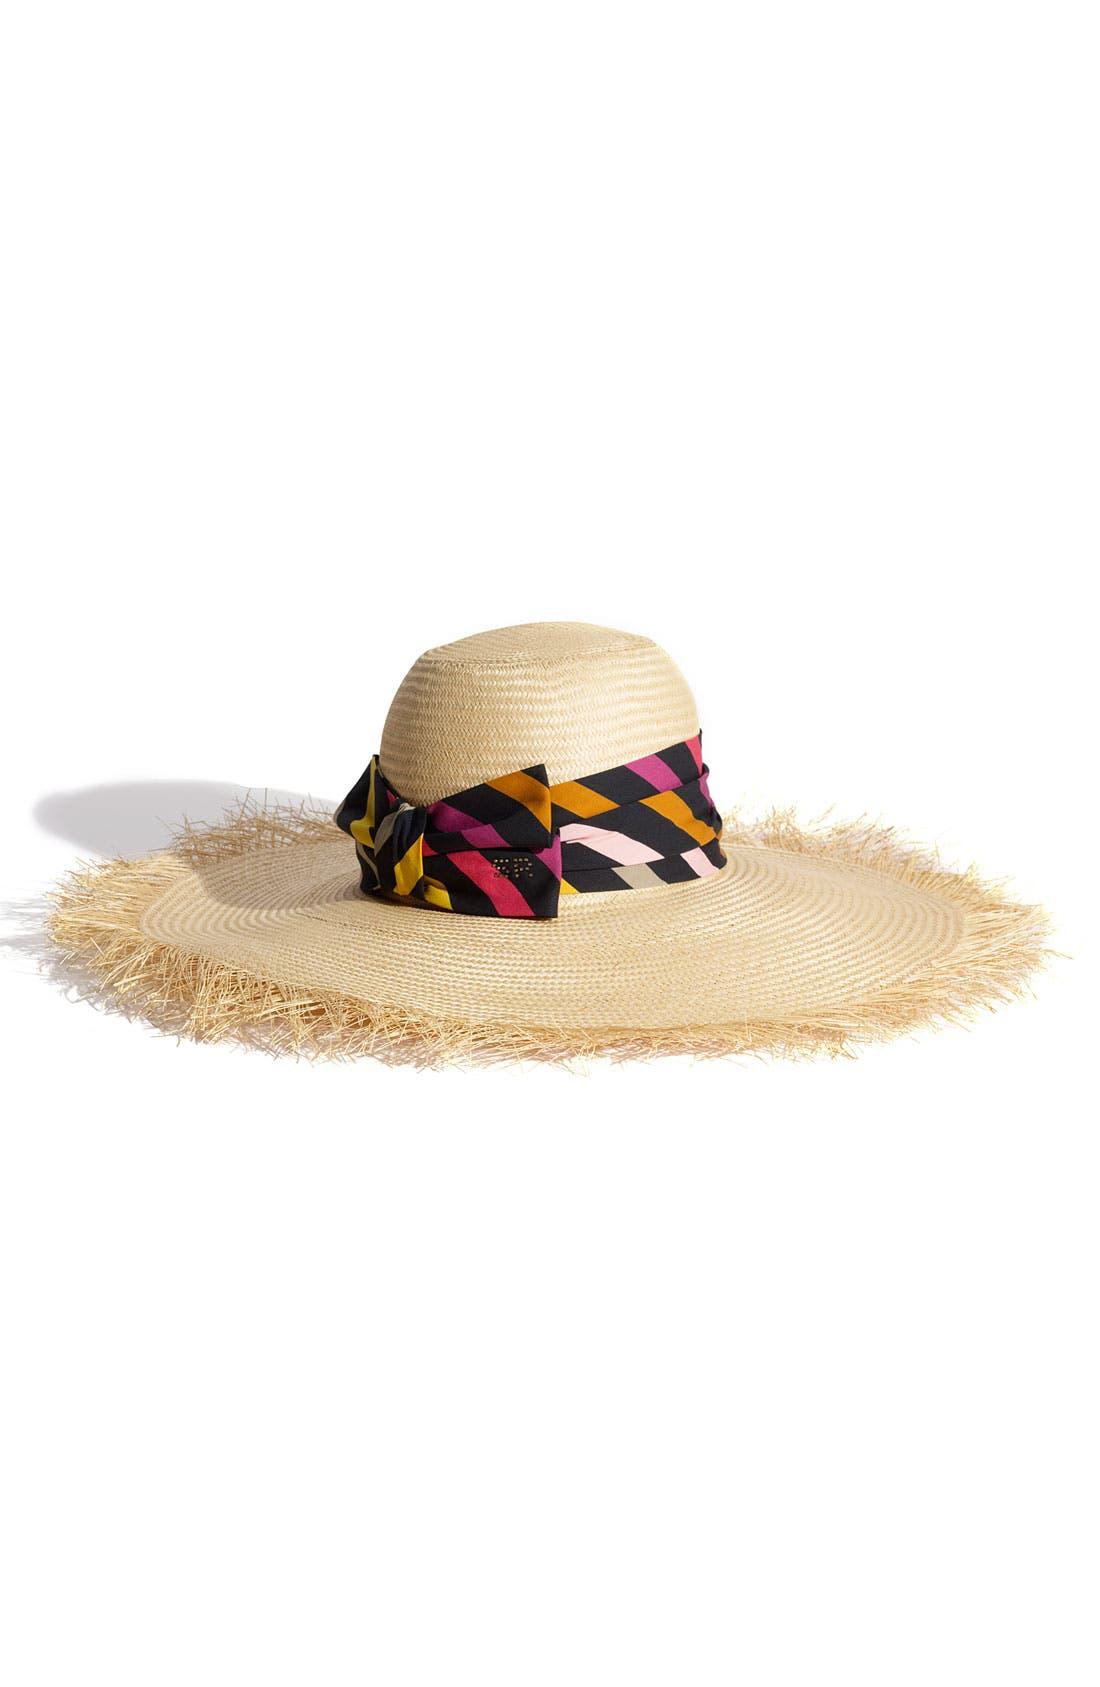 Alternate Image 1 Selected - Sonia Rykiel Straw Sun Hat